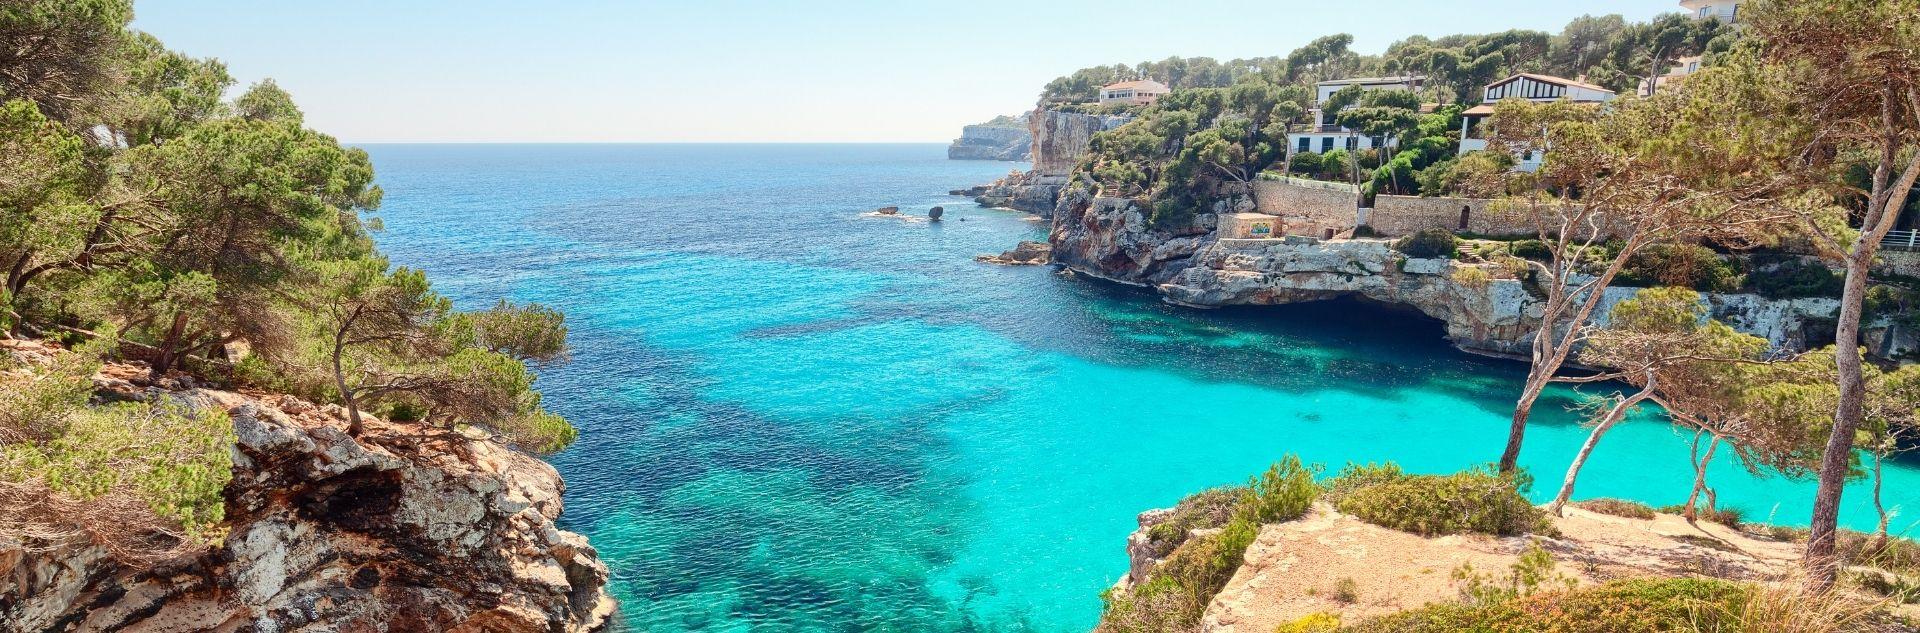 Meer in Mallorca im Mittelmeer Urlaub